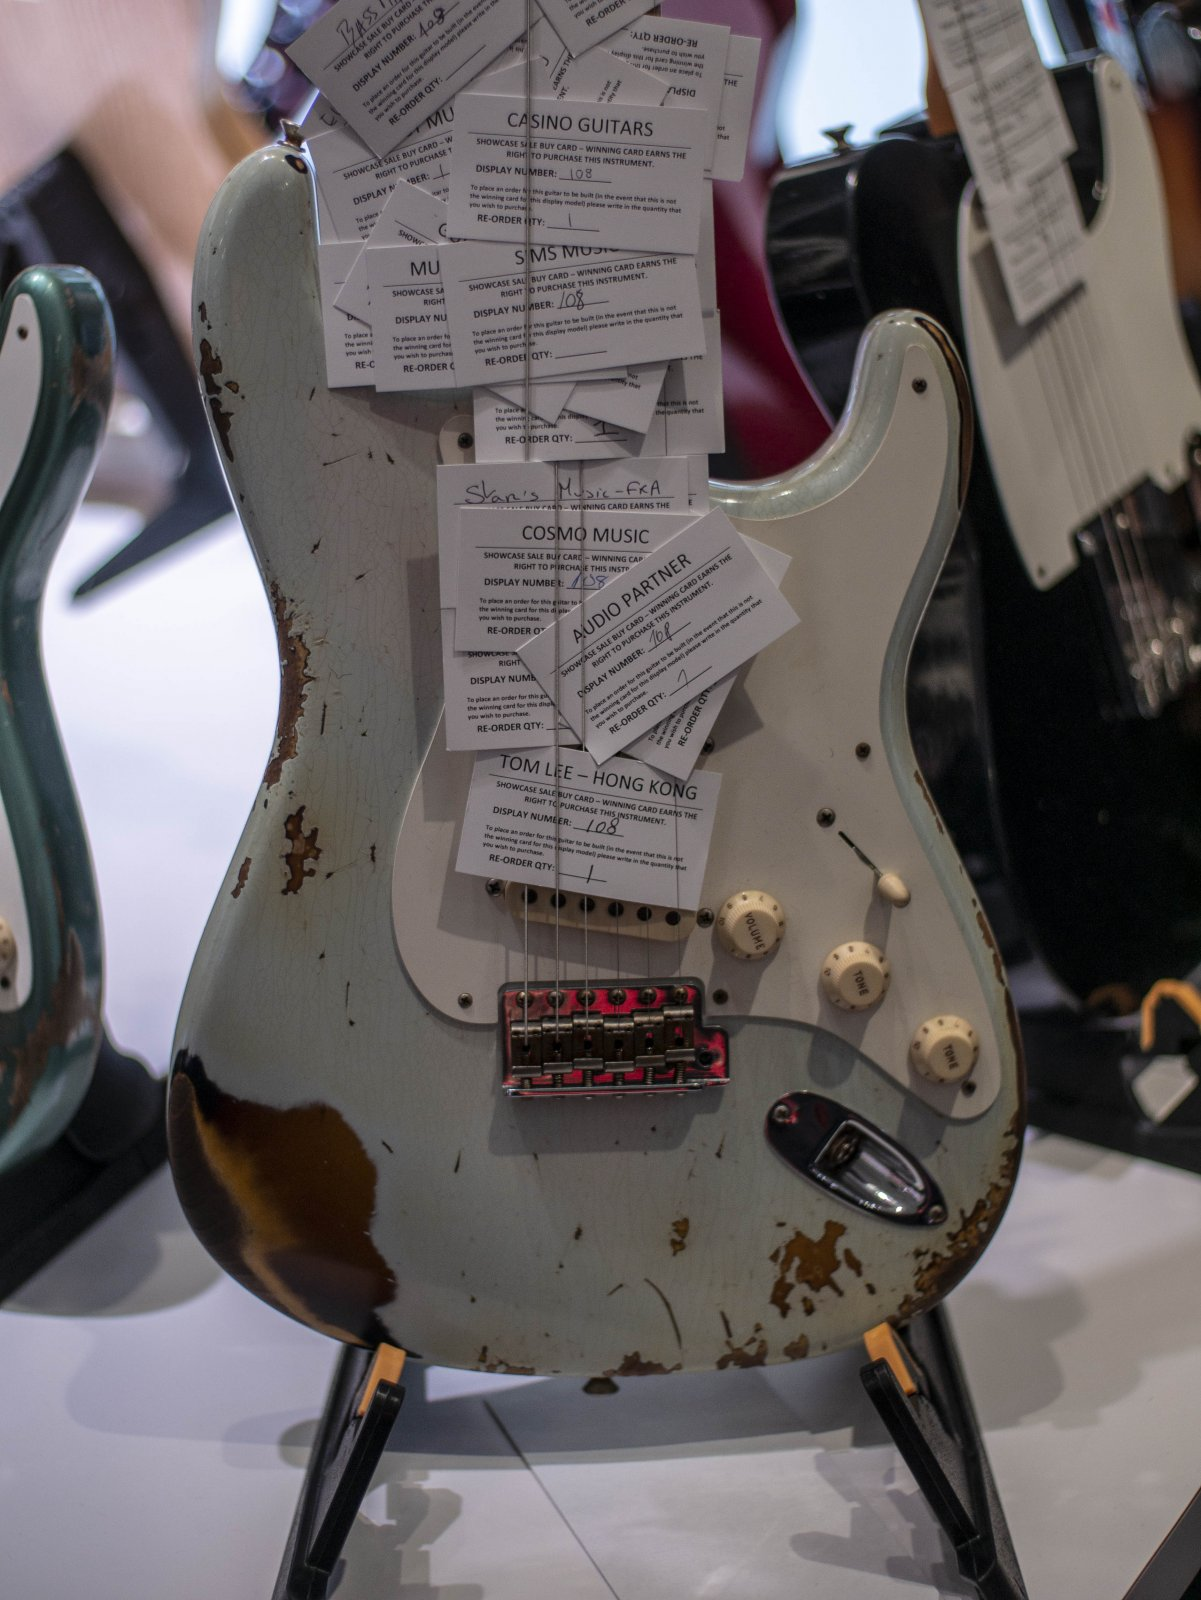 (Pre Order) NAMM SHOW 1956 Fender Custom Shop Stratocaster Super Faded/Aged Sonic Blue over 2tsb